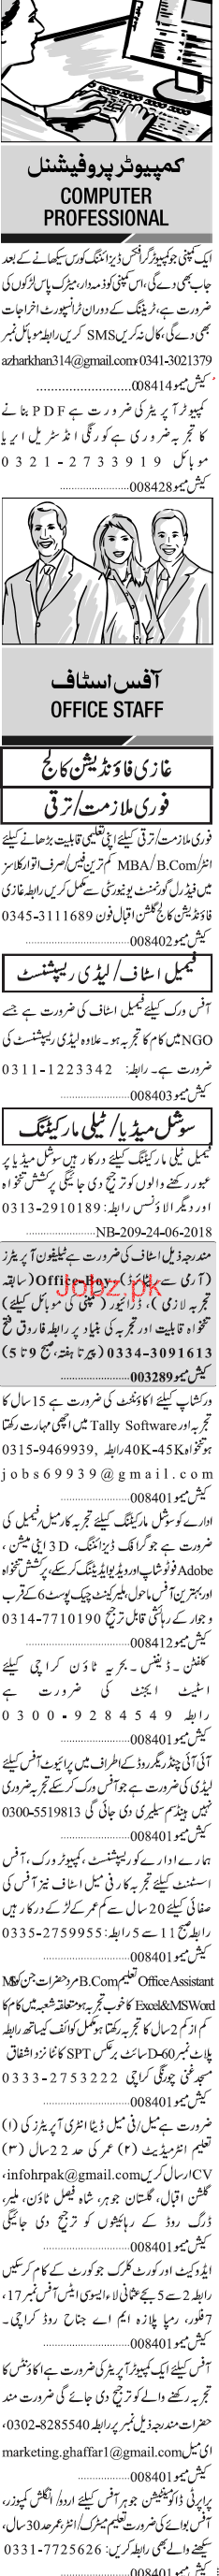 Sunday Jang Classified Computer Professional Jobs